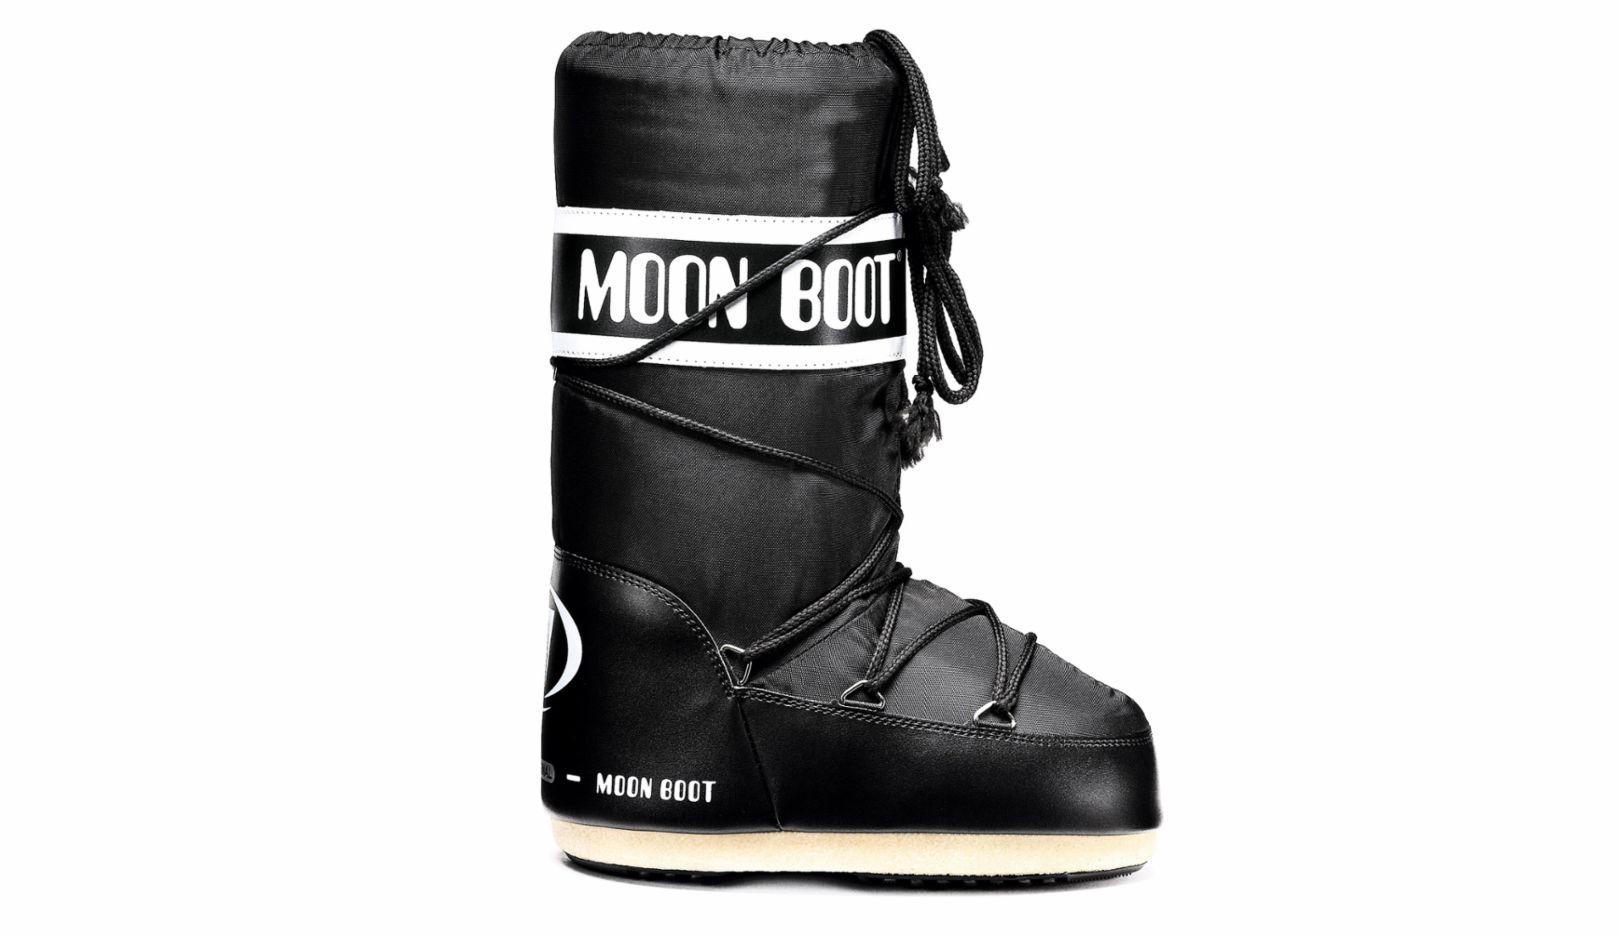 Moon Boot, 2016, Porsche Consulting GmbH